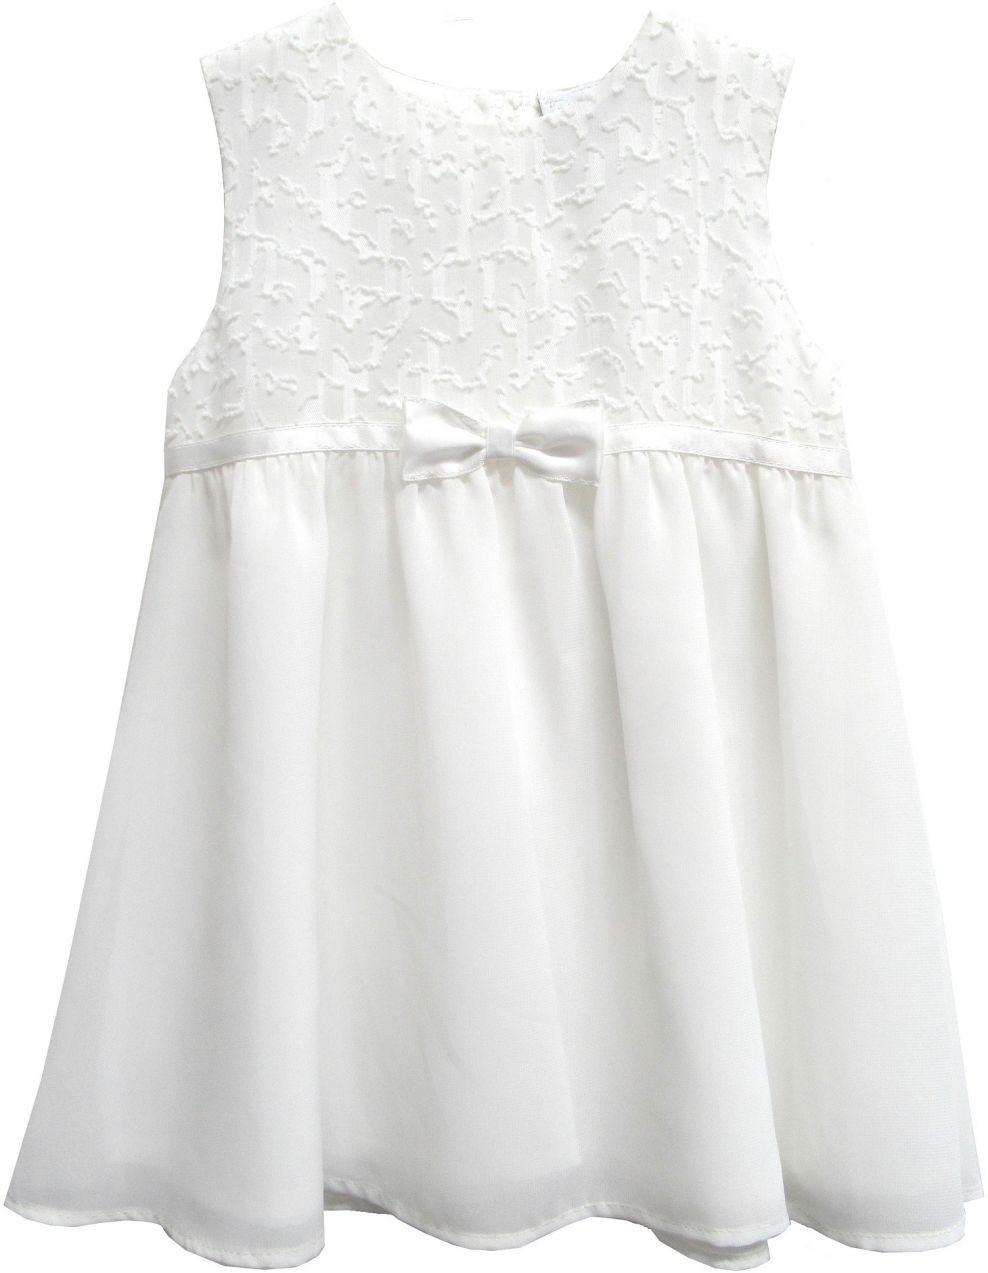 fbe7c4593688 Topo Dievčenské šaty - biele značky Topo - Lovely.sk